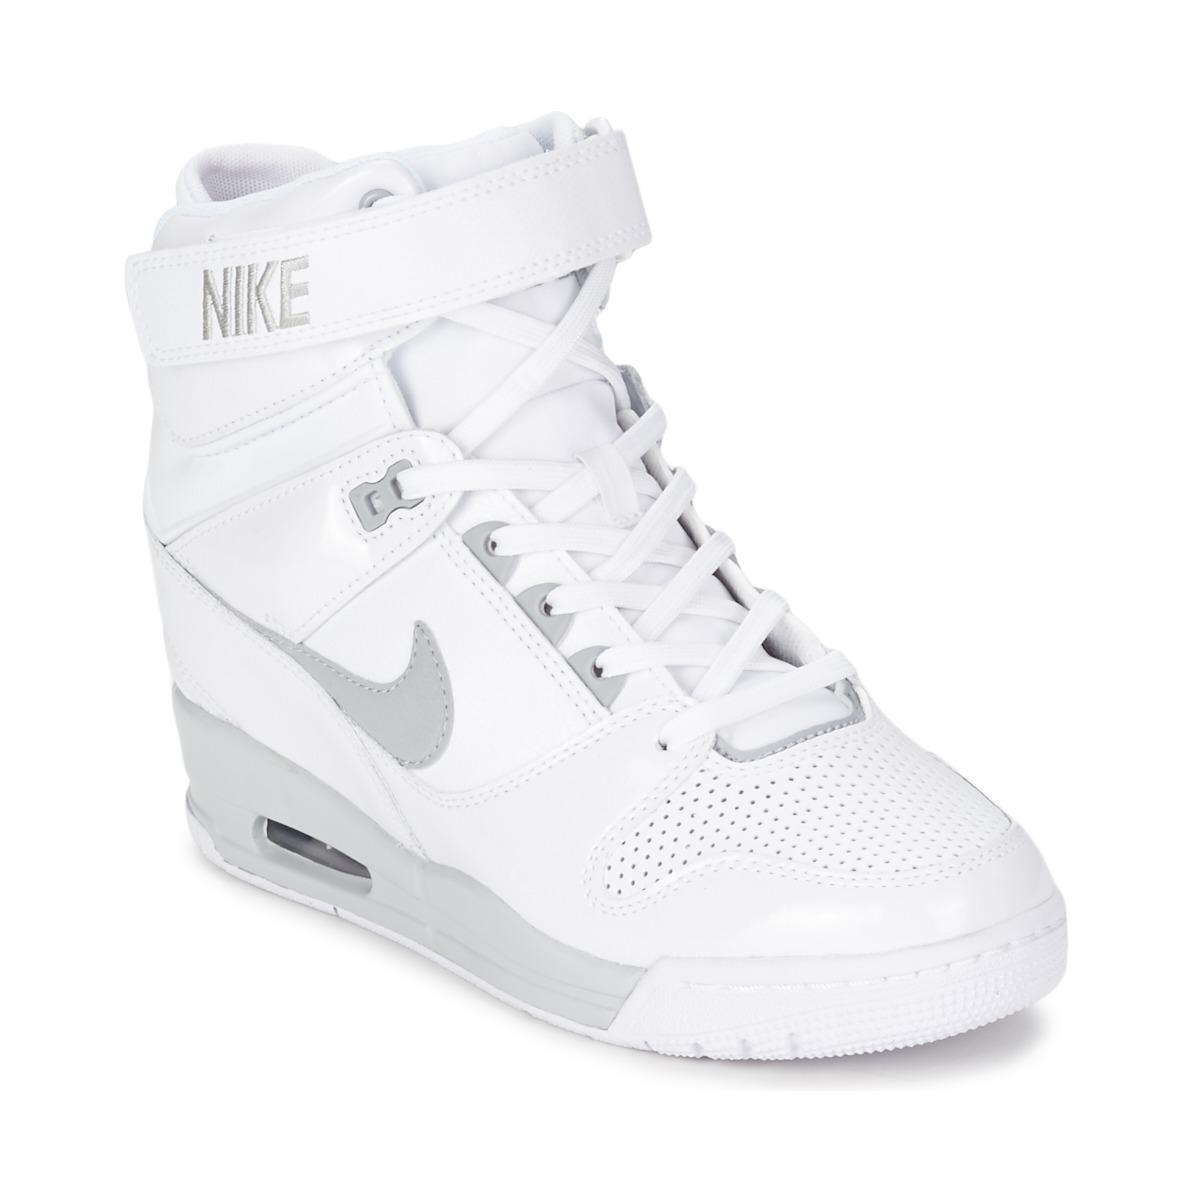 chaussure adidas montant femme pas cher